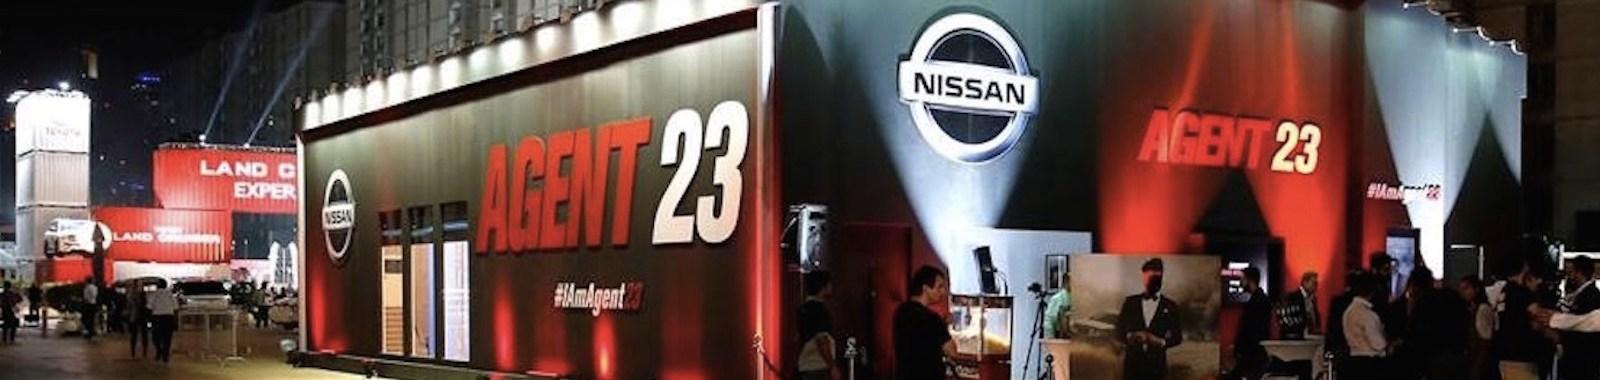 Nissan-